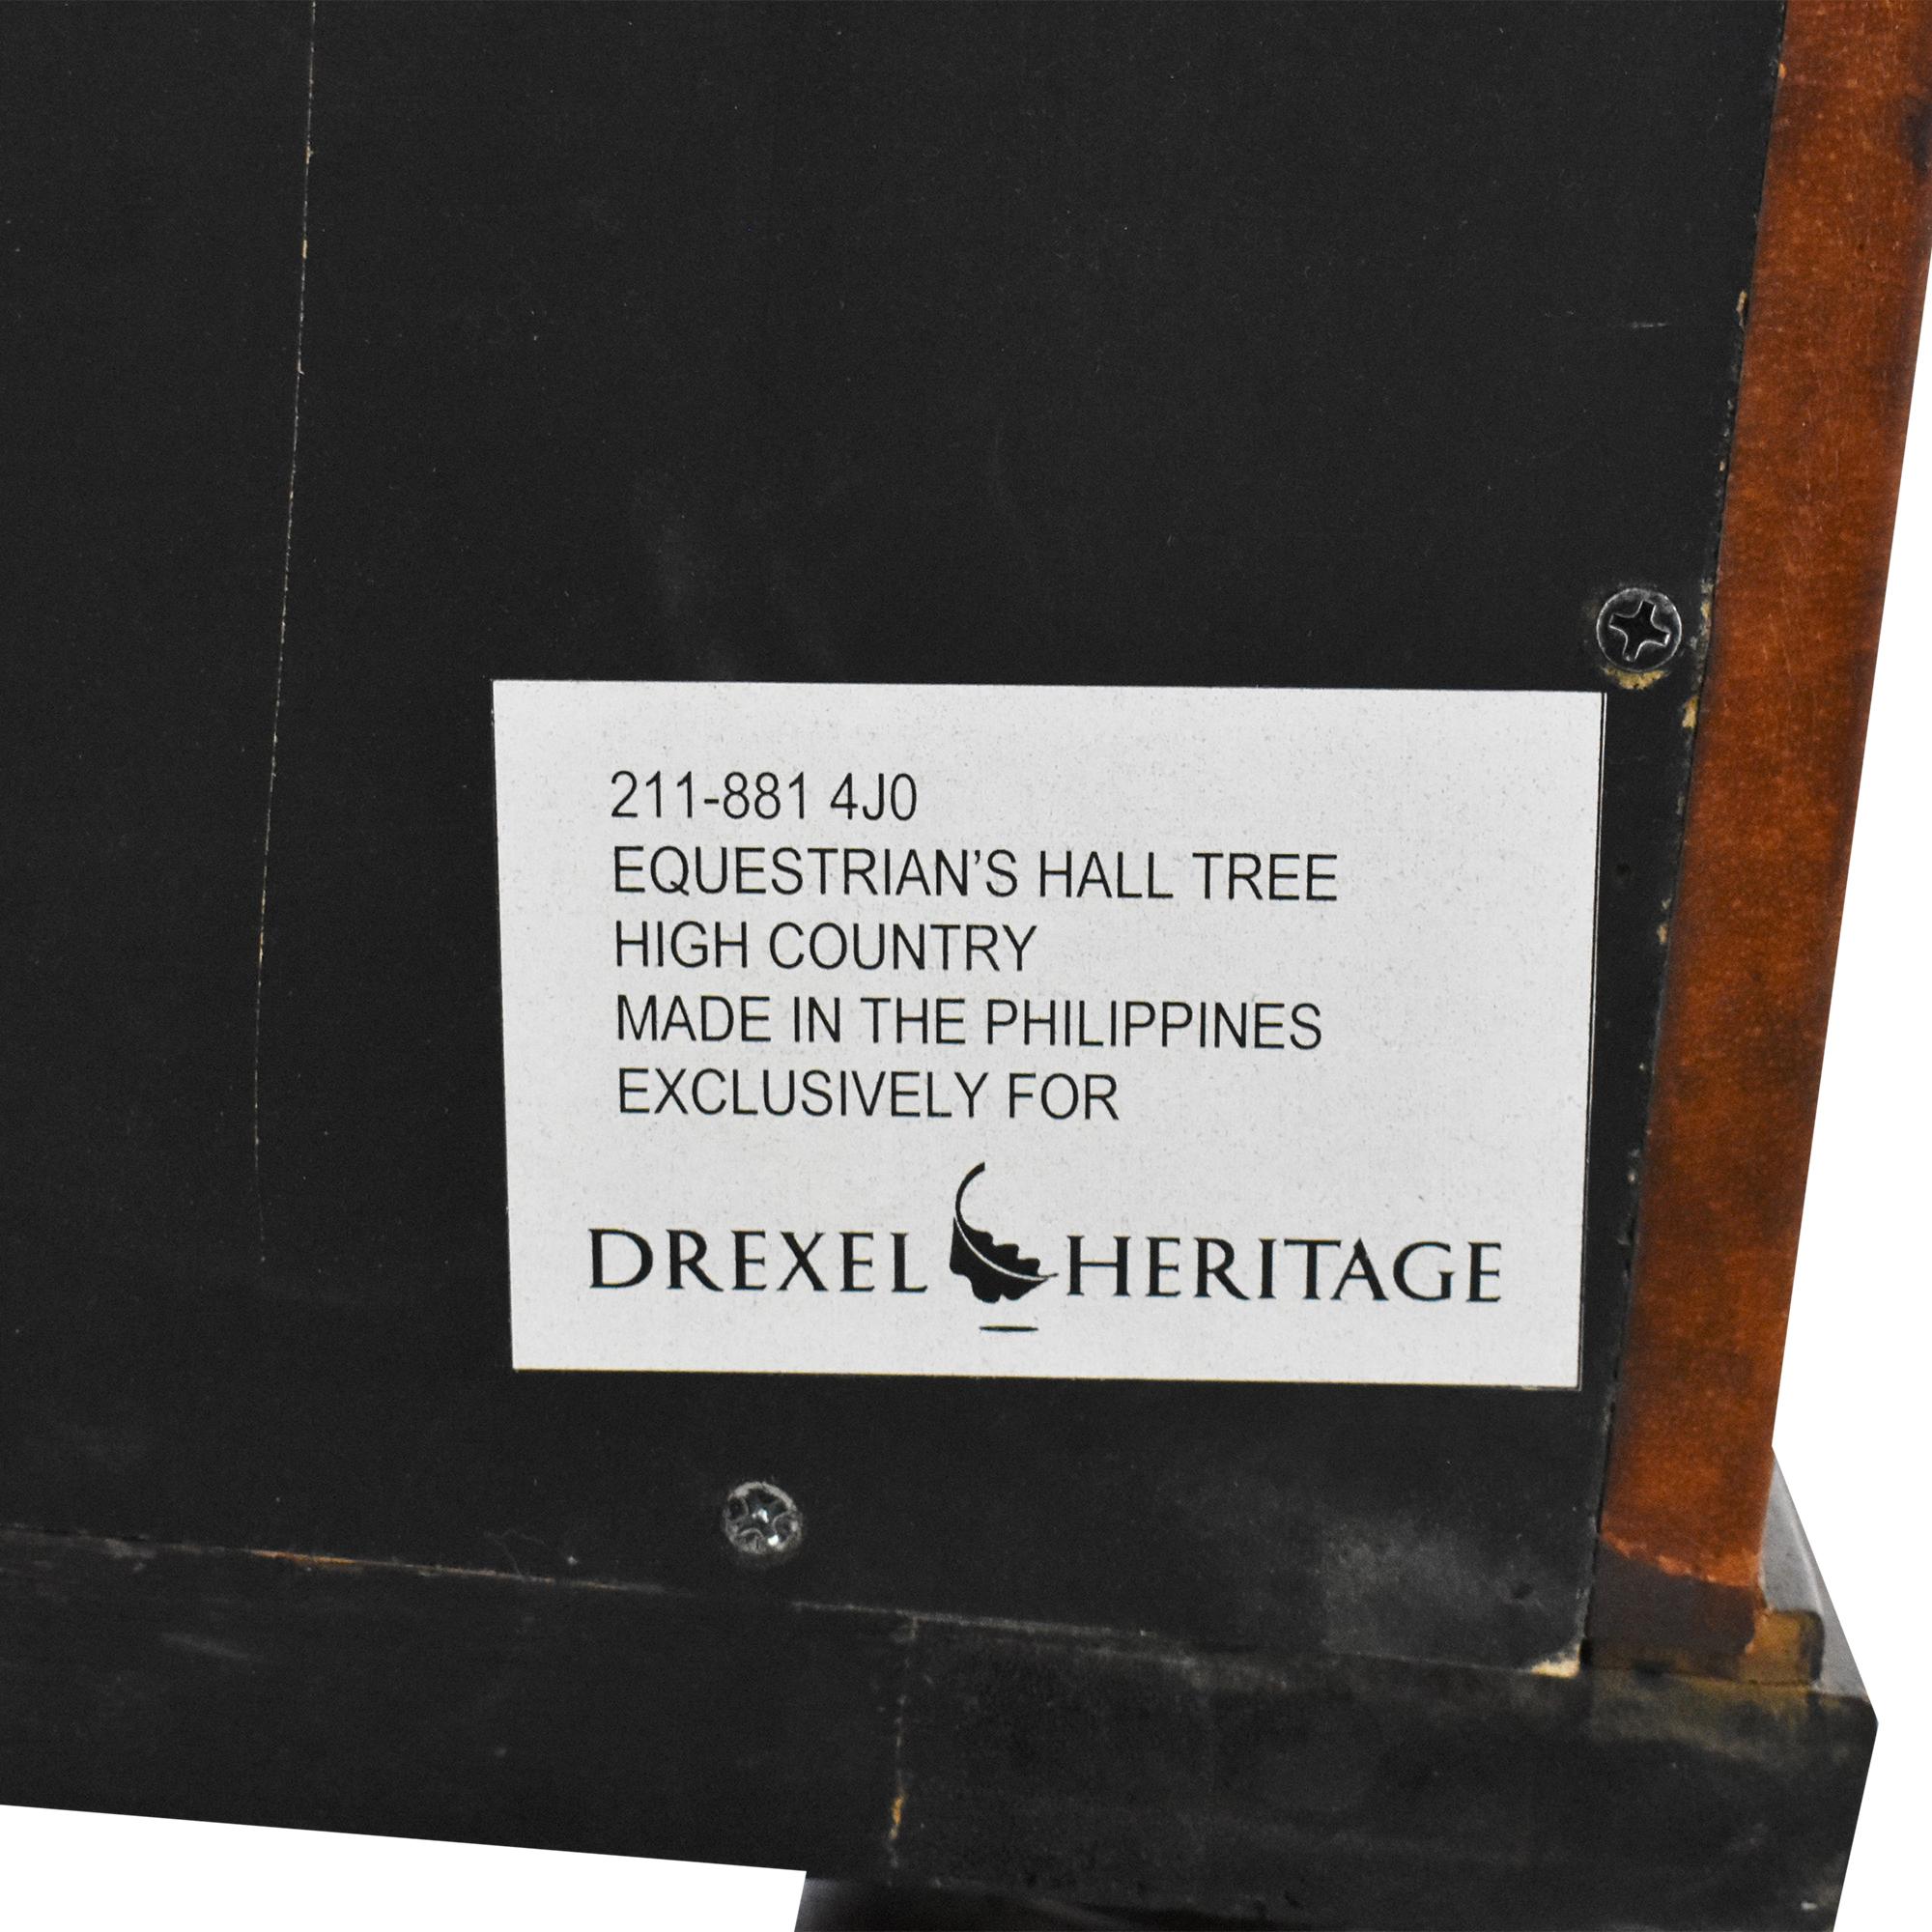 buy Drexel Heritage Equestrian's Hall Tree Drexel Heritage Storage